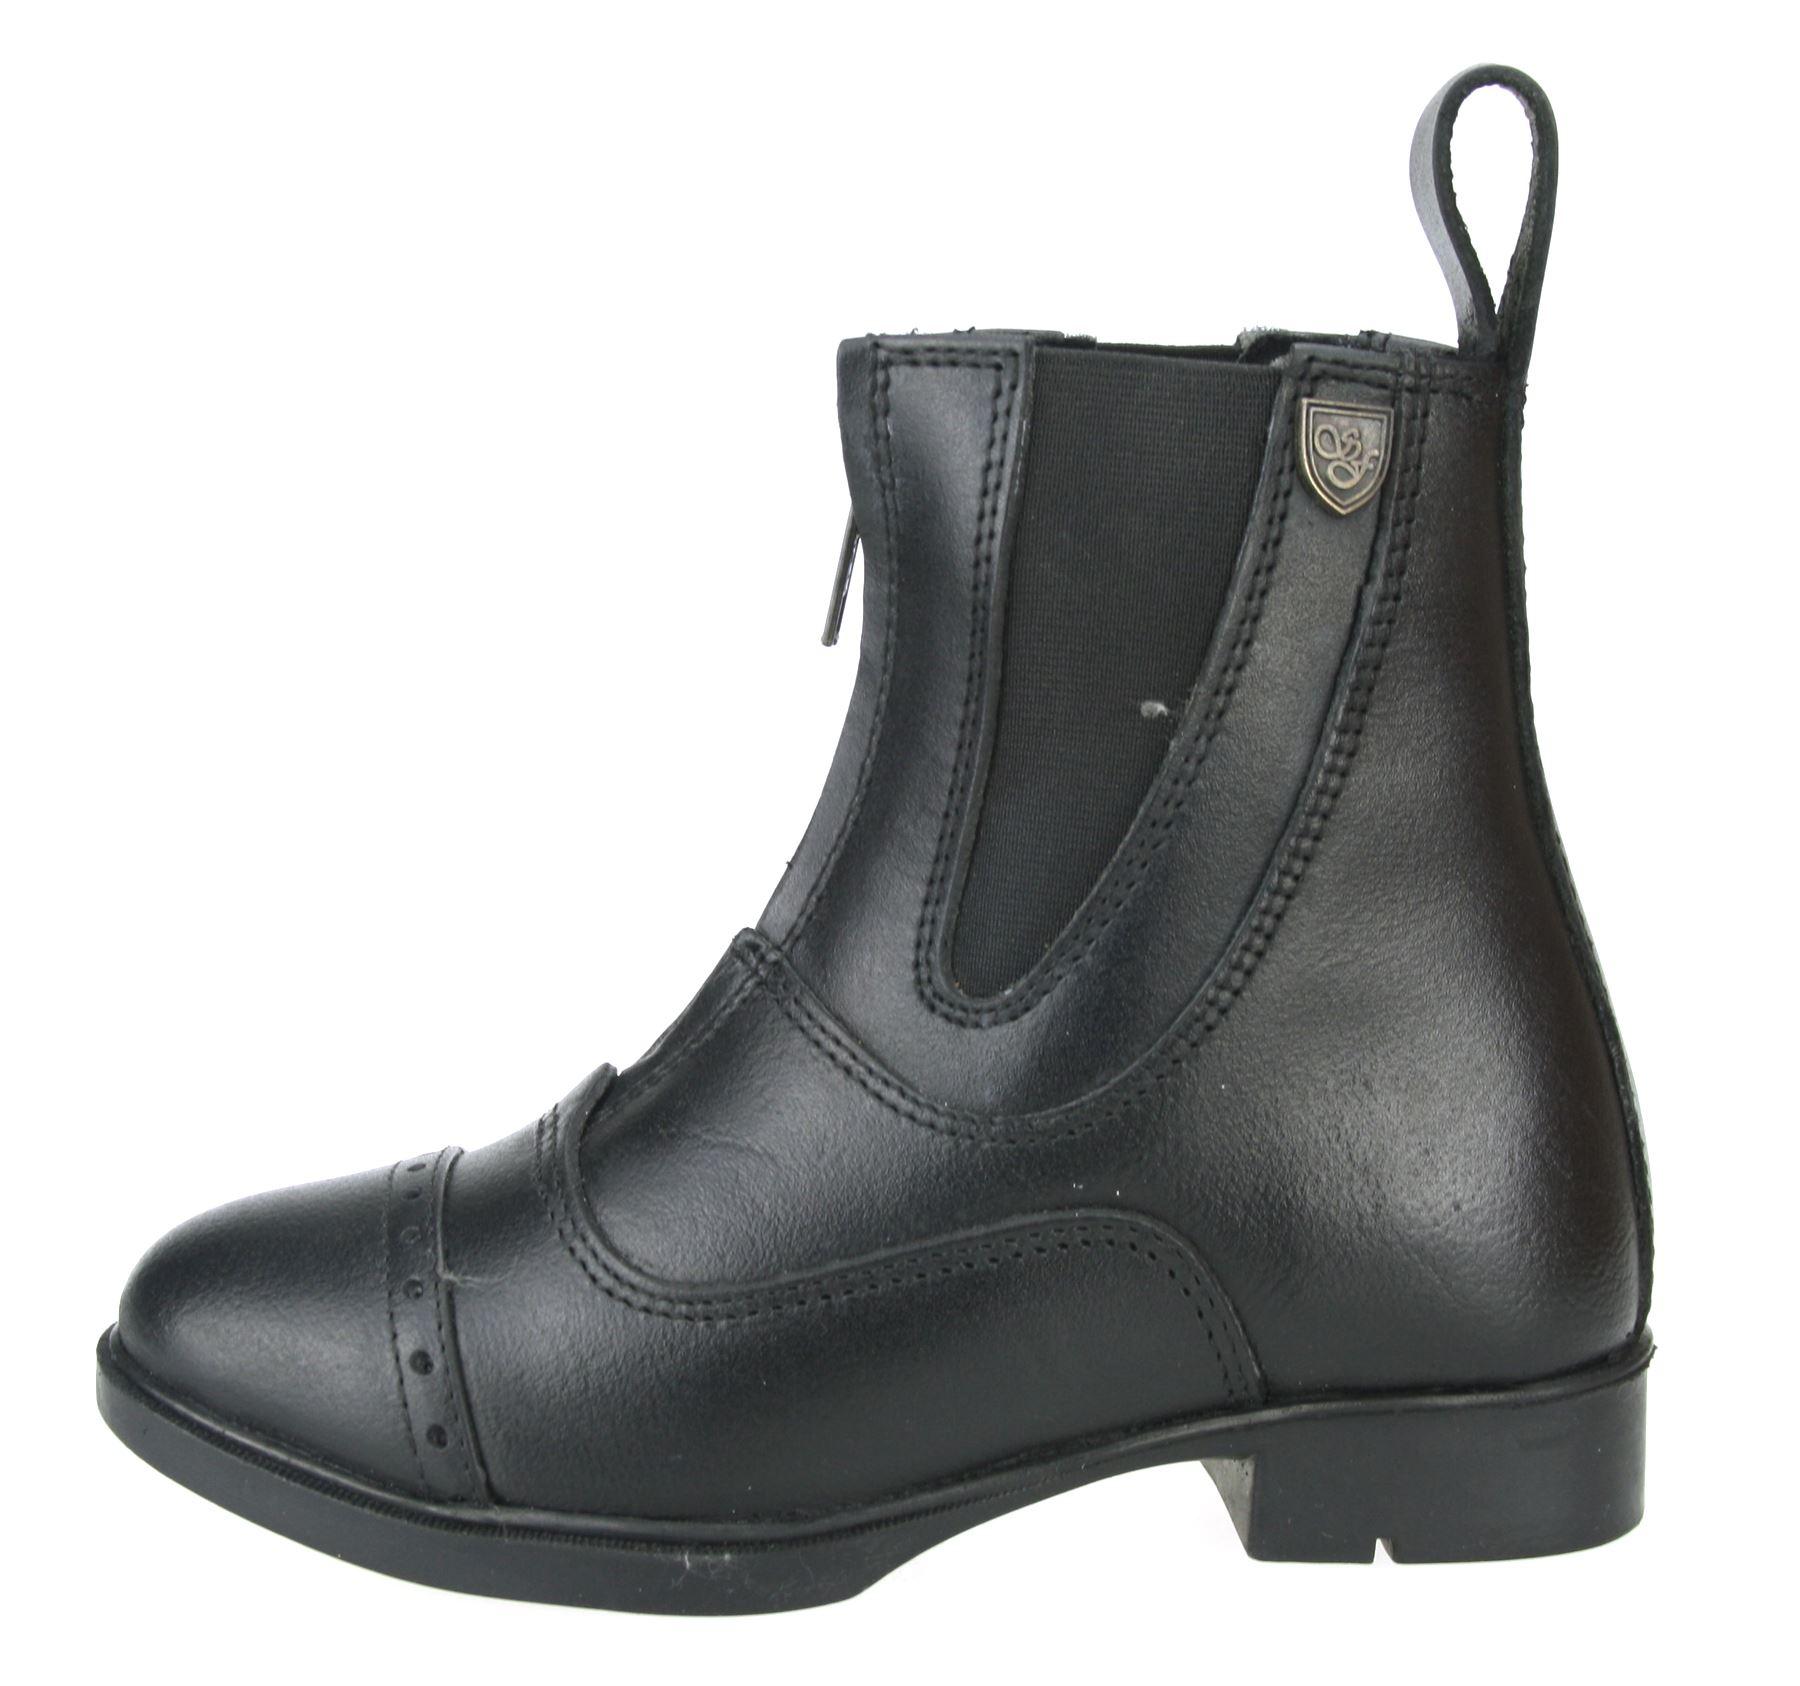 Sherwood Junior Boys Girls Leather Zip Up Brown Black Riding ...